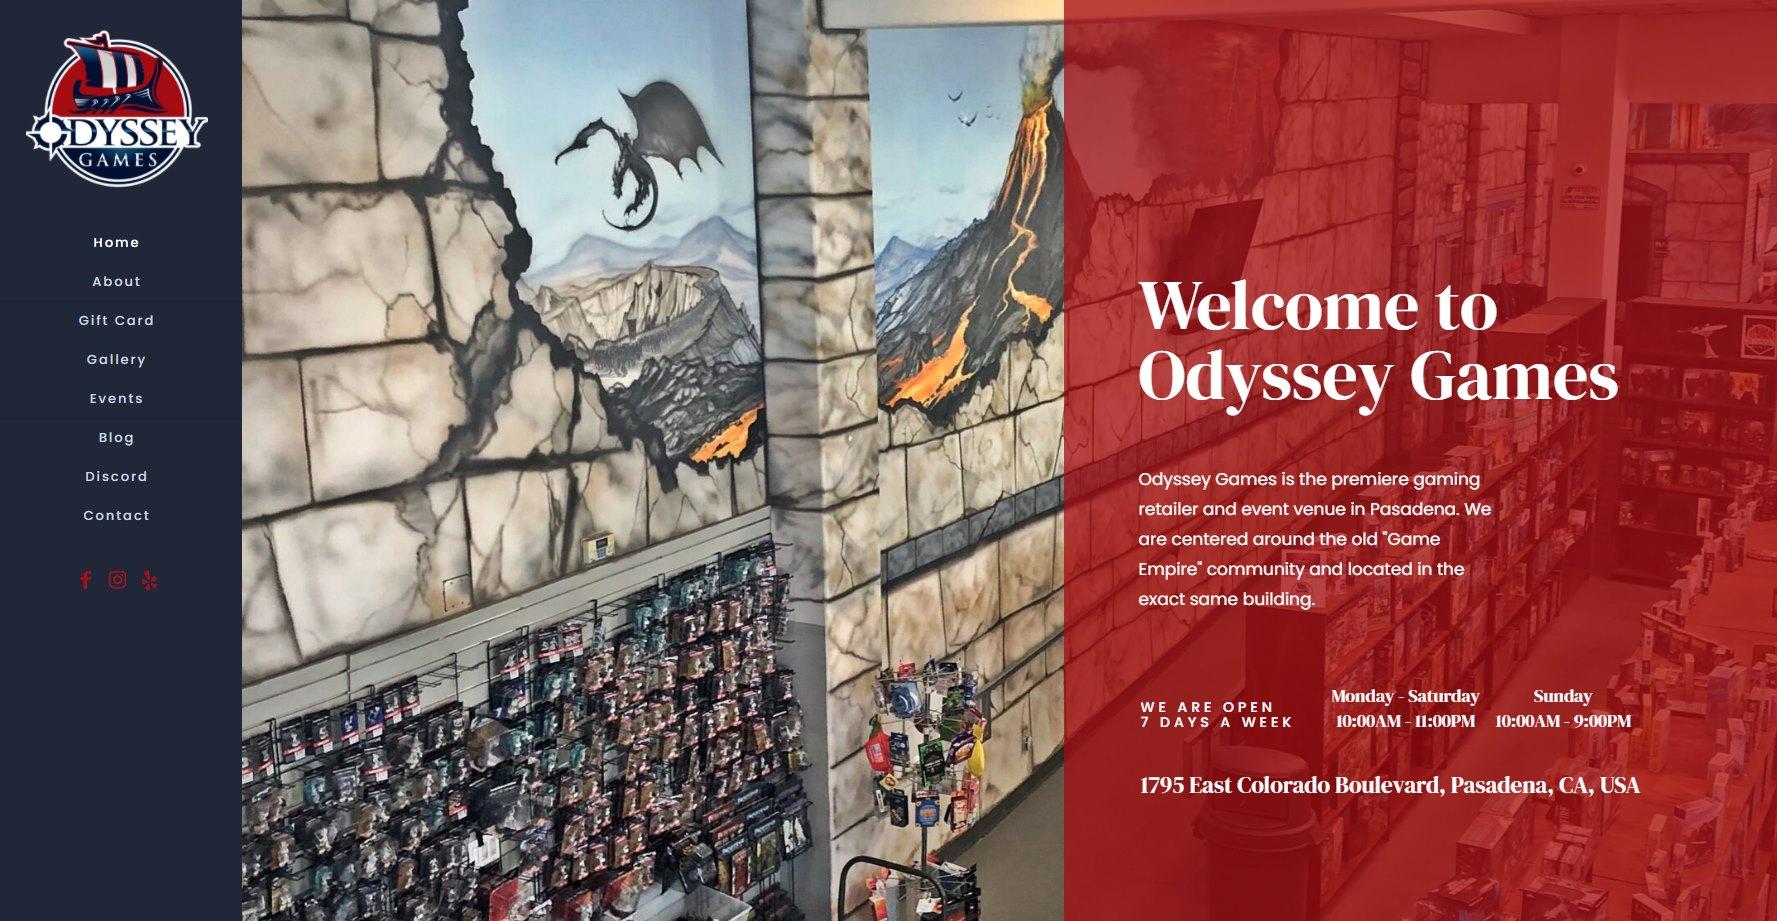 odyssey games website